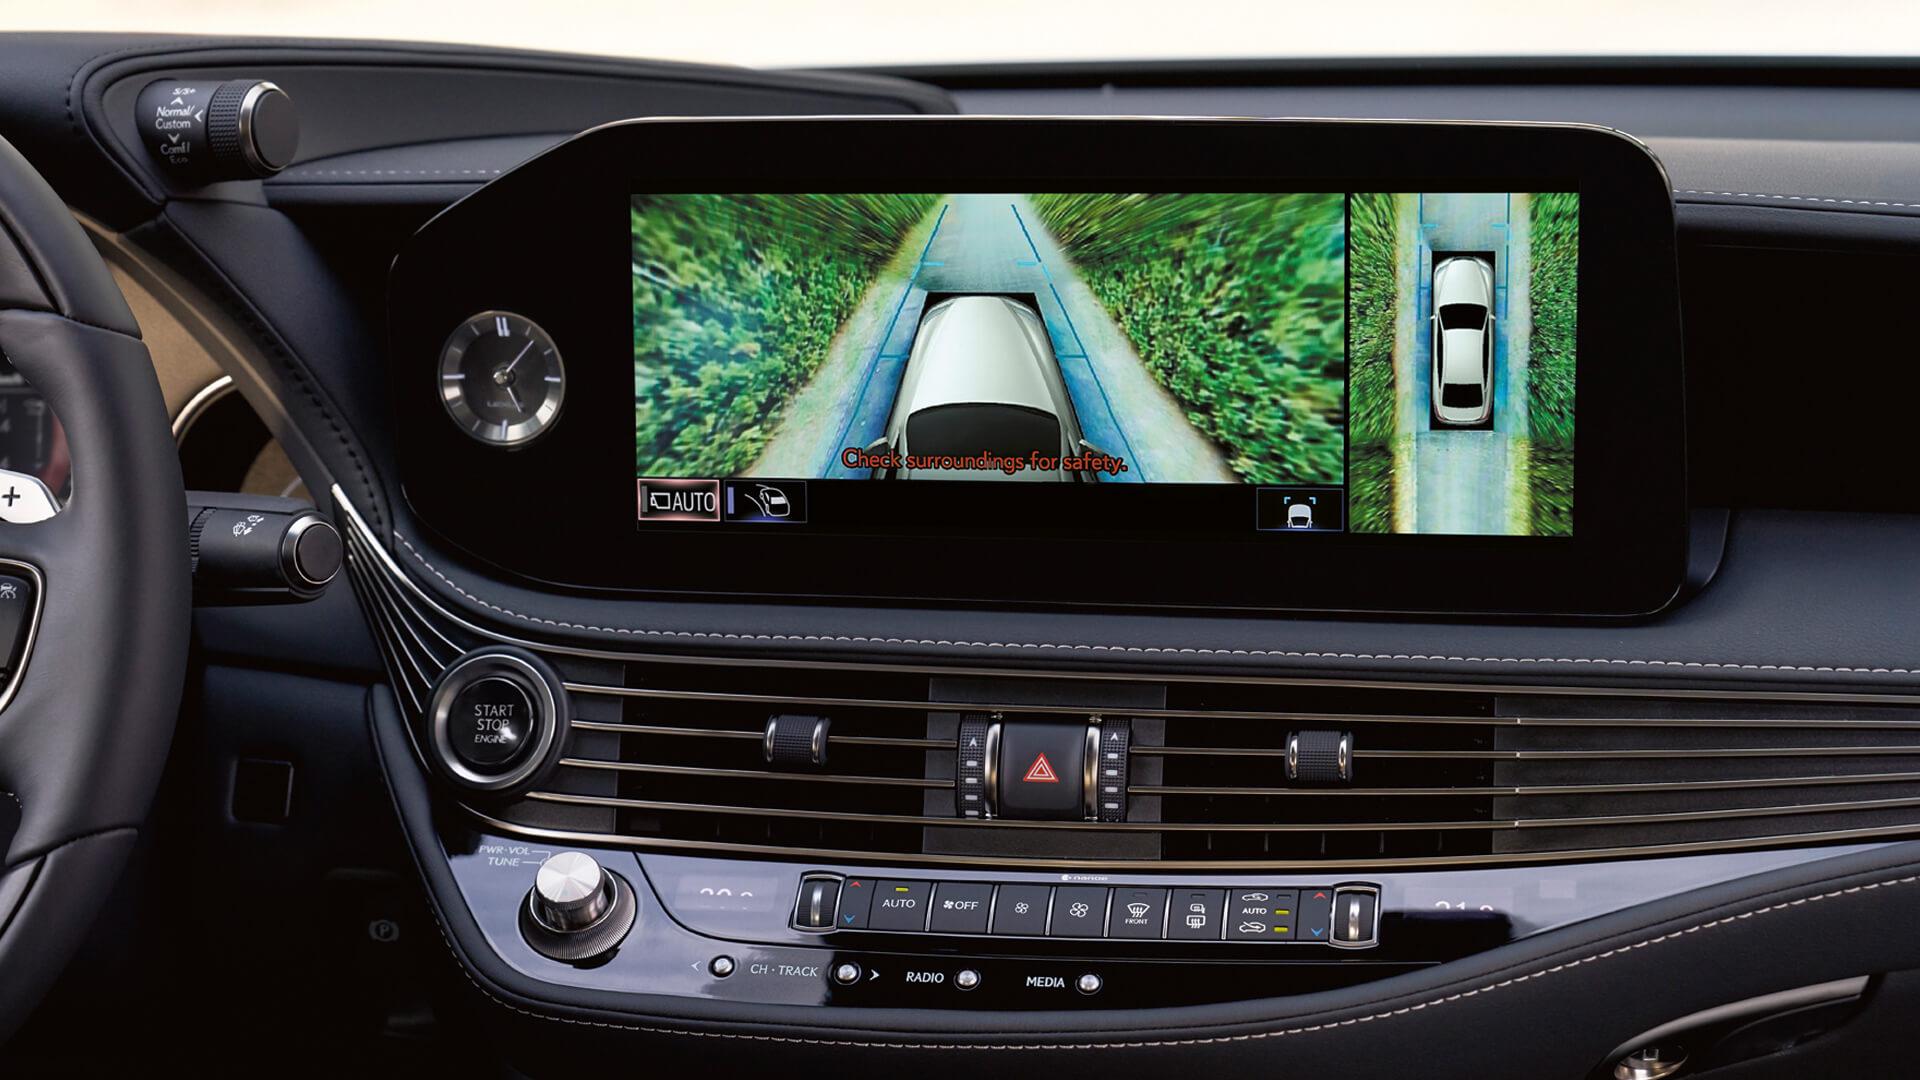 new 2020 lexus ls experience digital panoramic view monitor